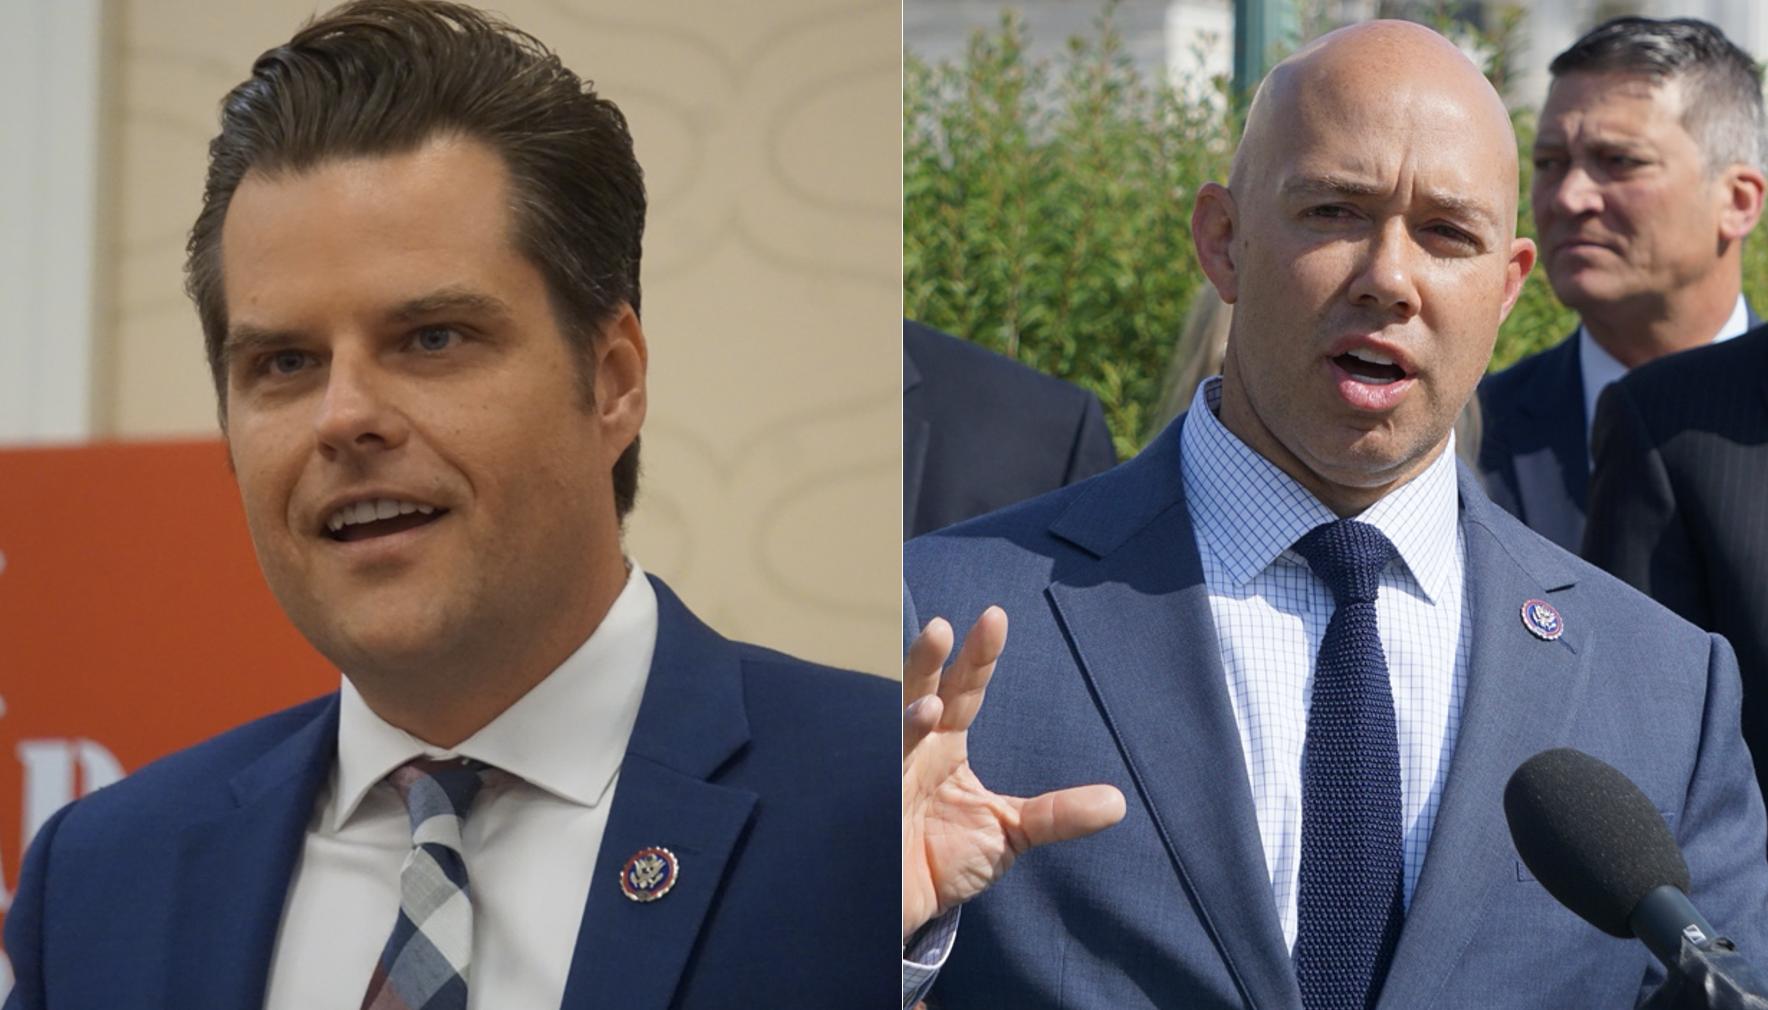 Florida's Congressional Republicans Crush Democrats in Fundraising